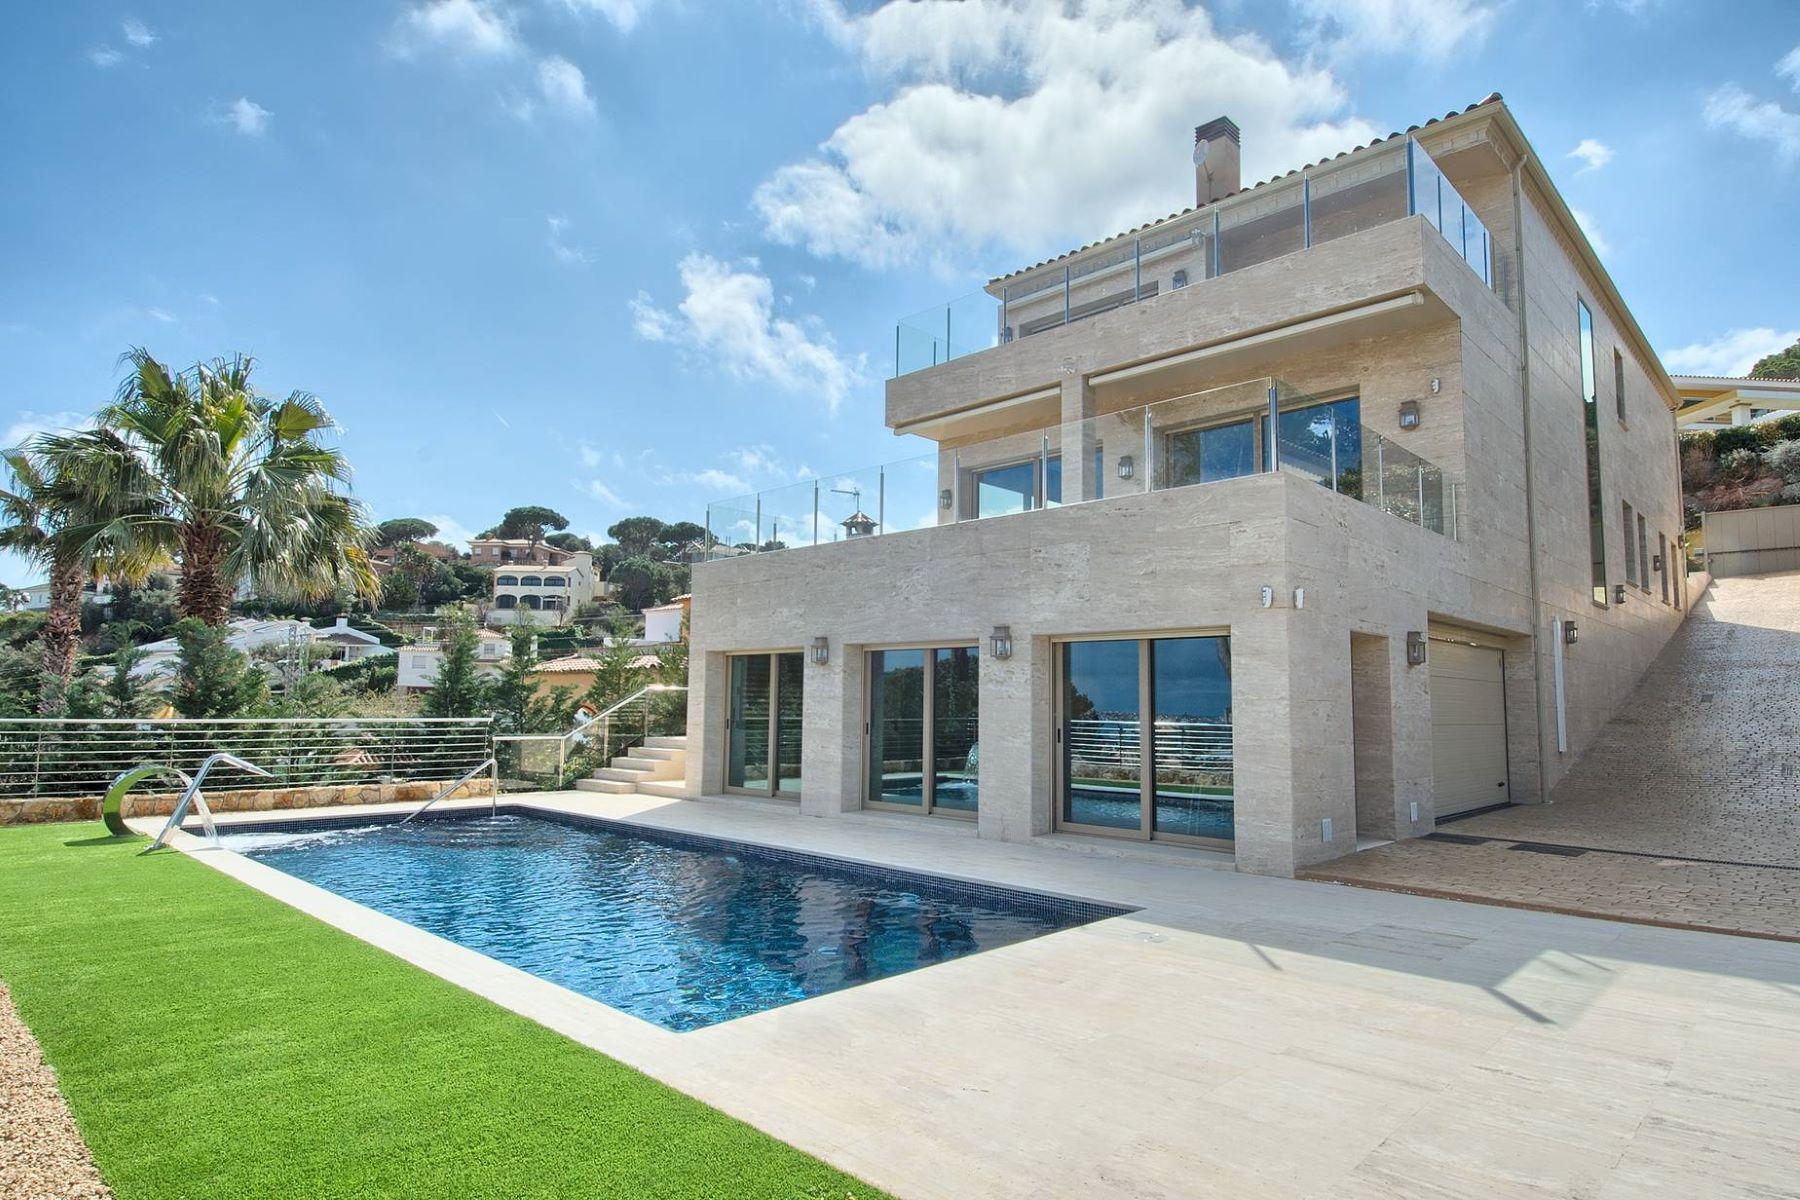 Single Family Home for Sale at Spacious newly built villa with sea views Sant Antoni De Calonge, Costa Brava, 17252 Spain